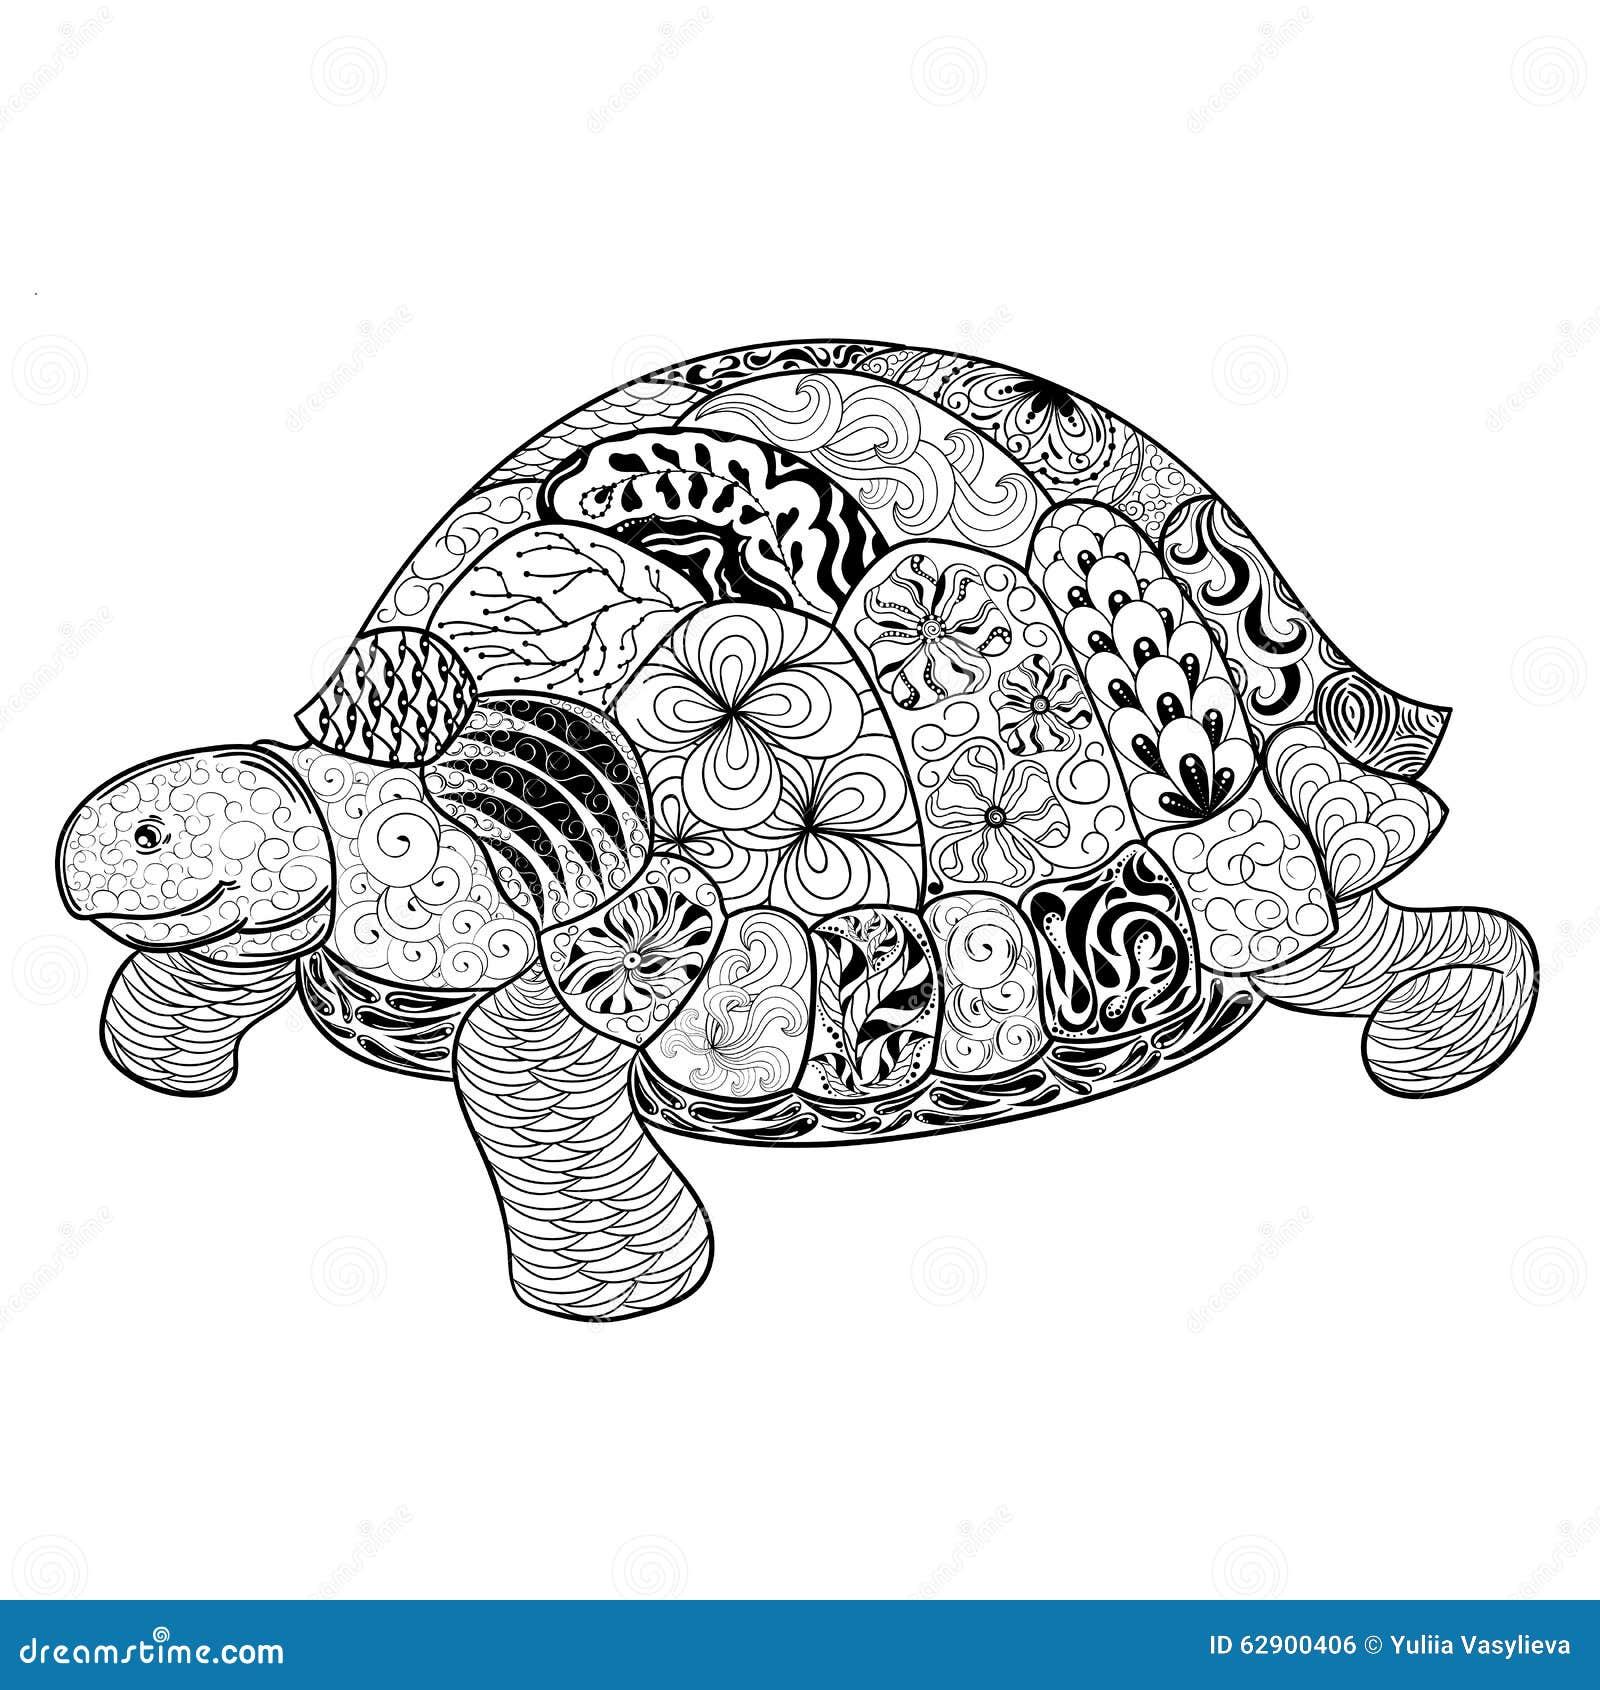 Turtle Doodle Illustration Stock Vector - Image: 62900406